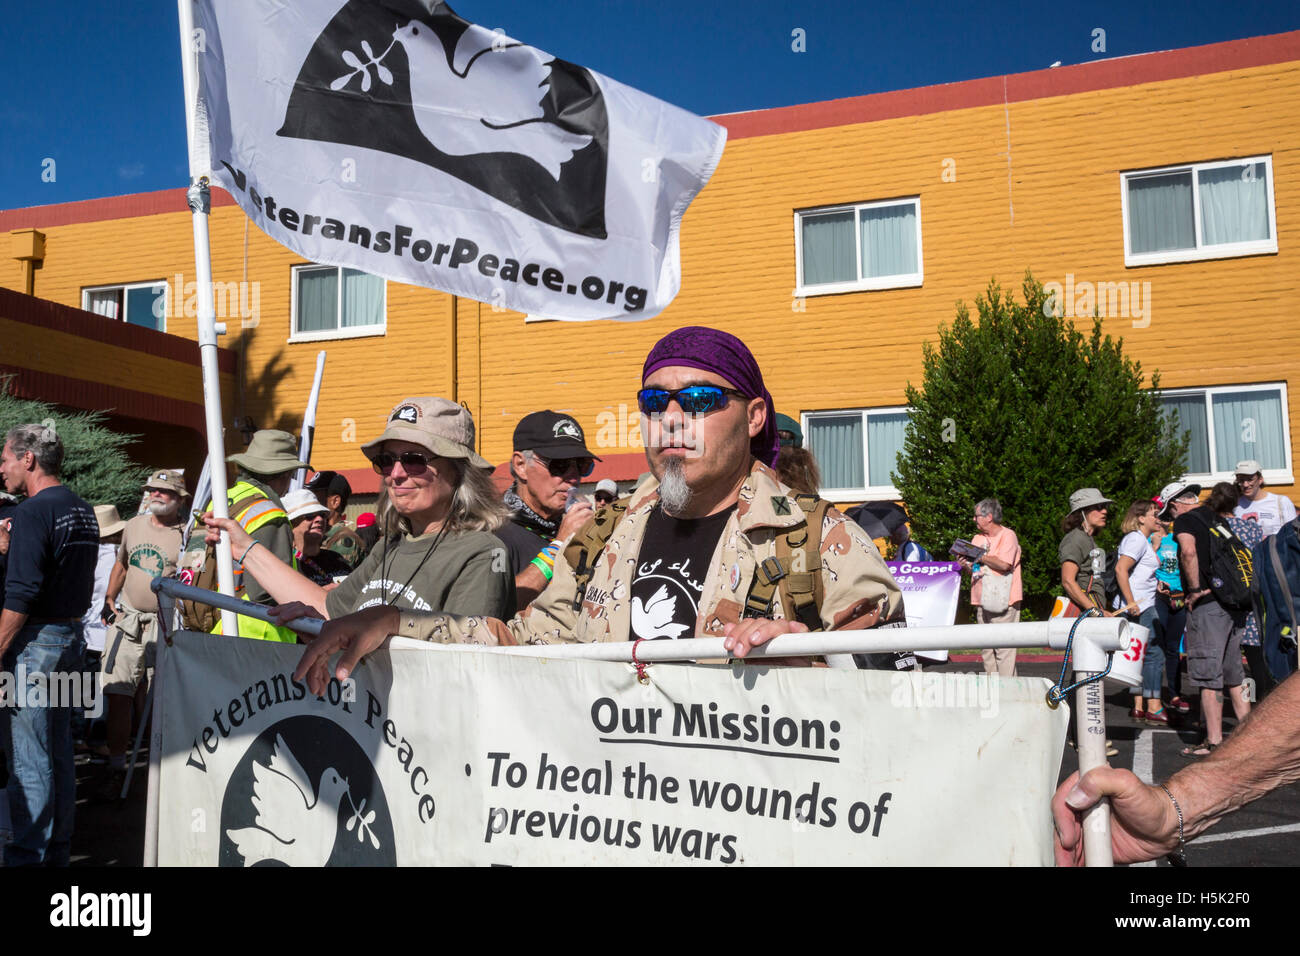 Nogales, Arizona - Veterans led international rallies protesting the U.S.-Mexico border fence. - Stock Image